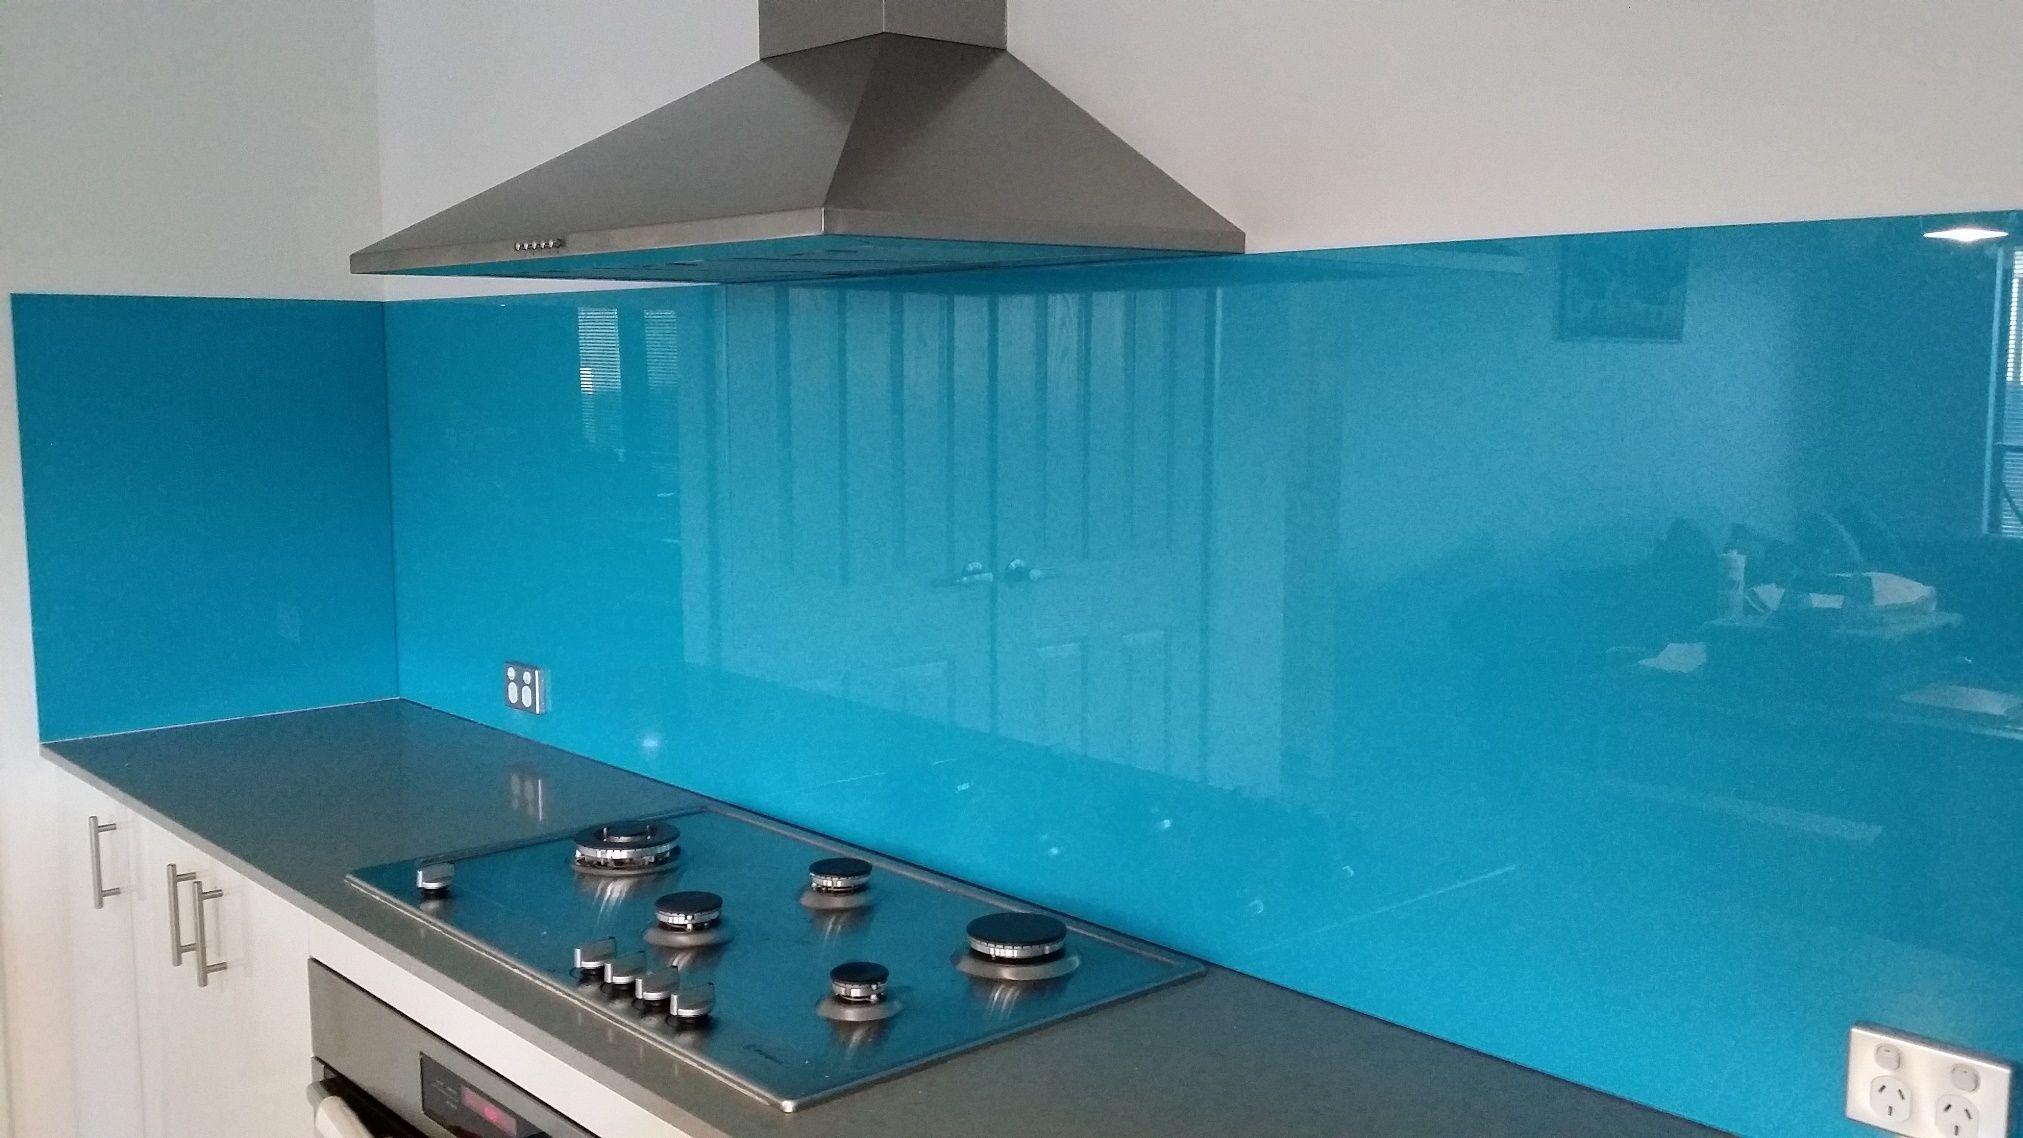 Kitchen Tiles Glass Splashback blue glass kitchen splashback - google search | kitchen and dining